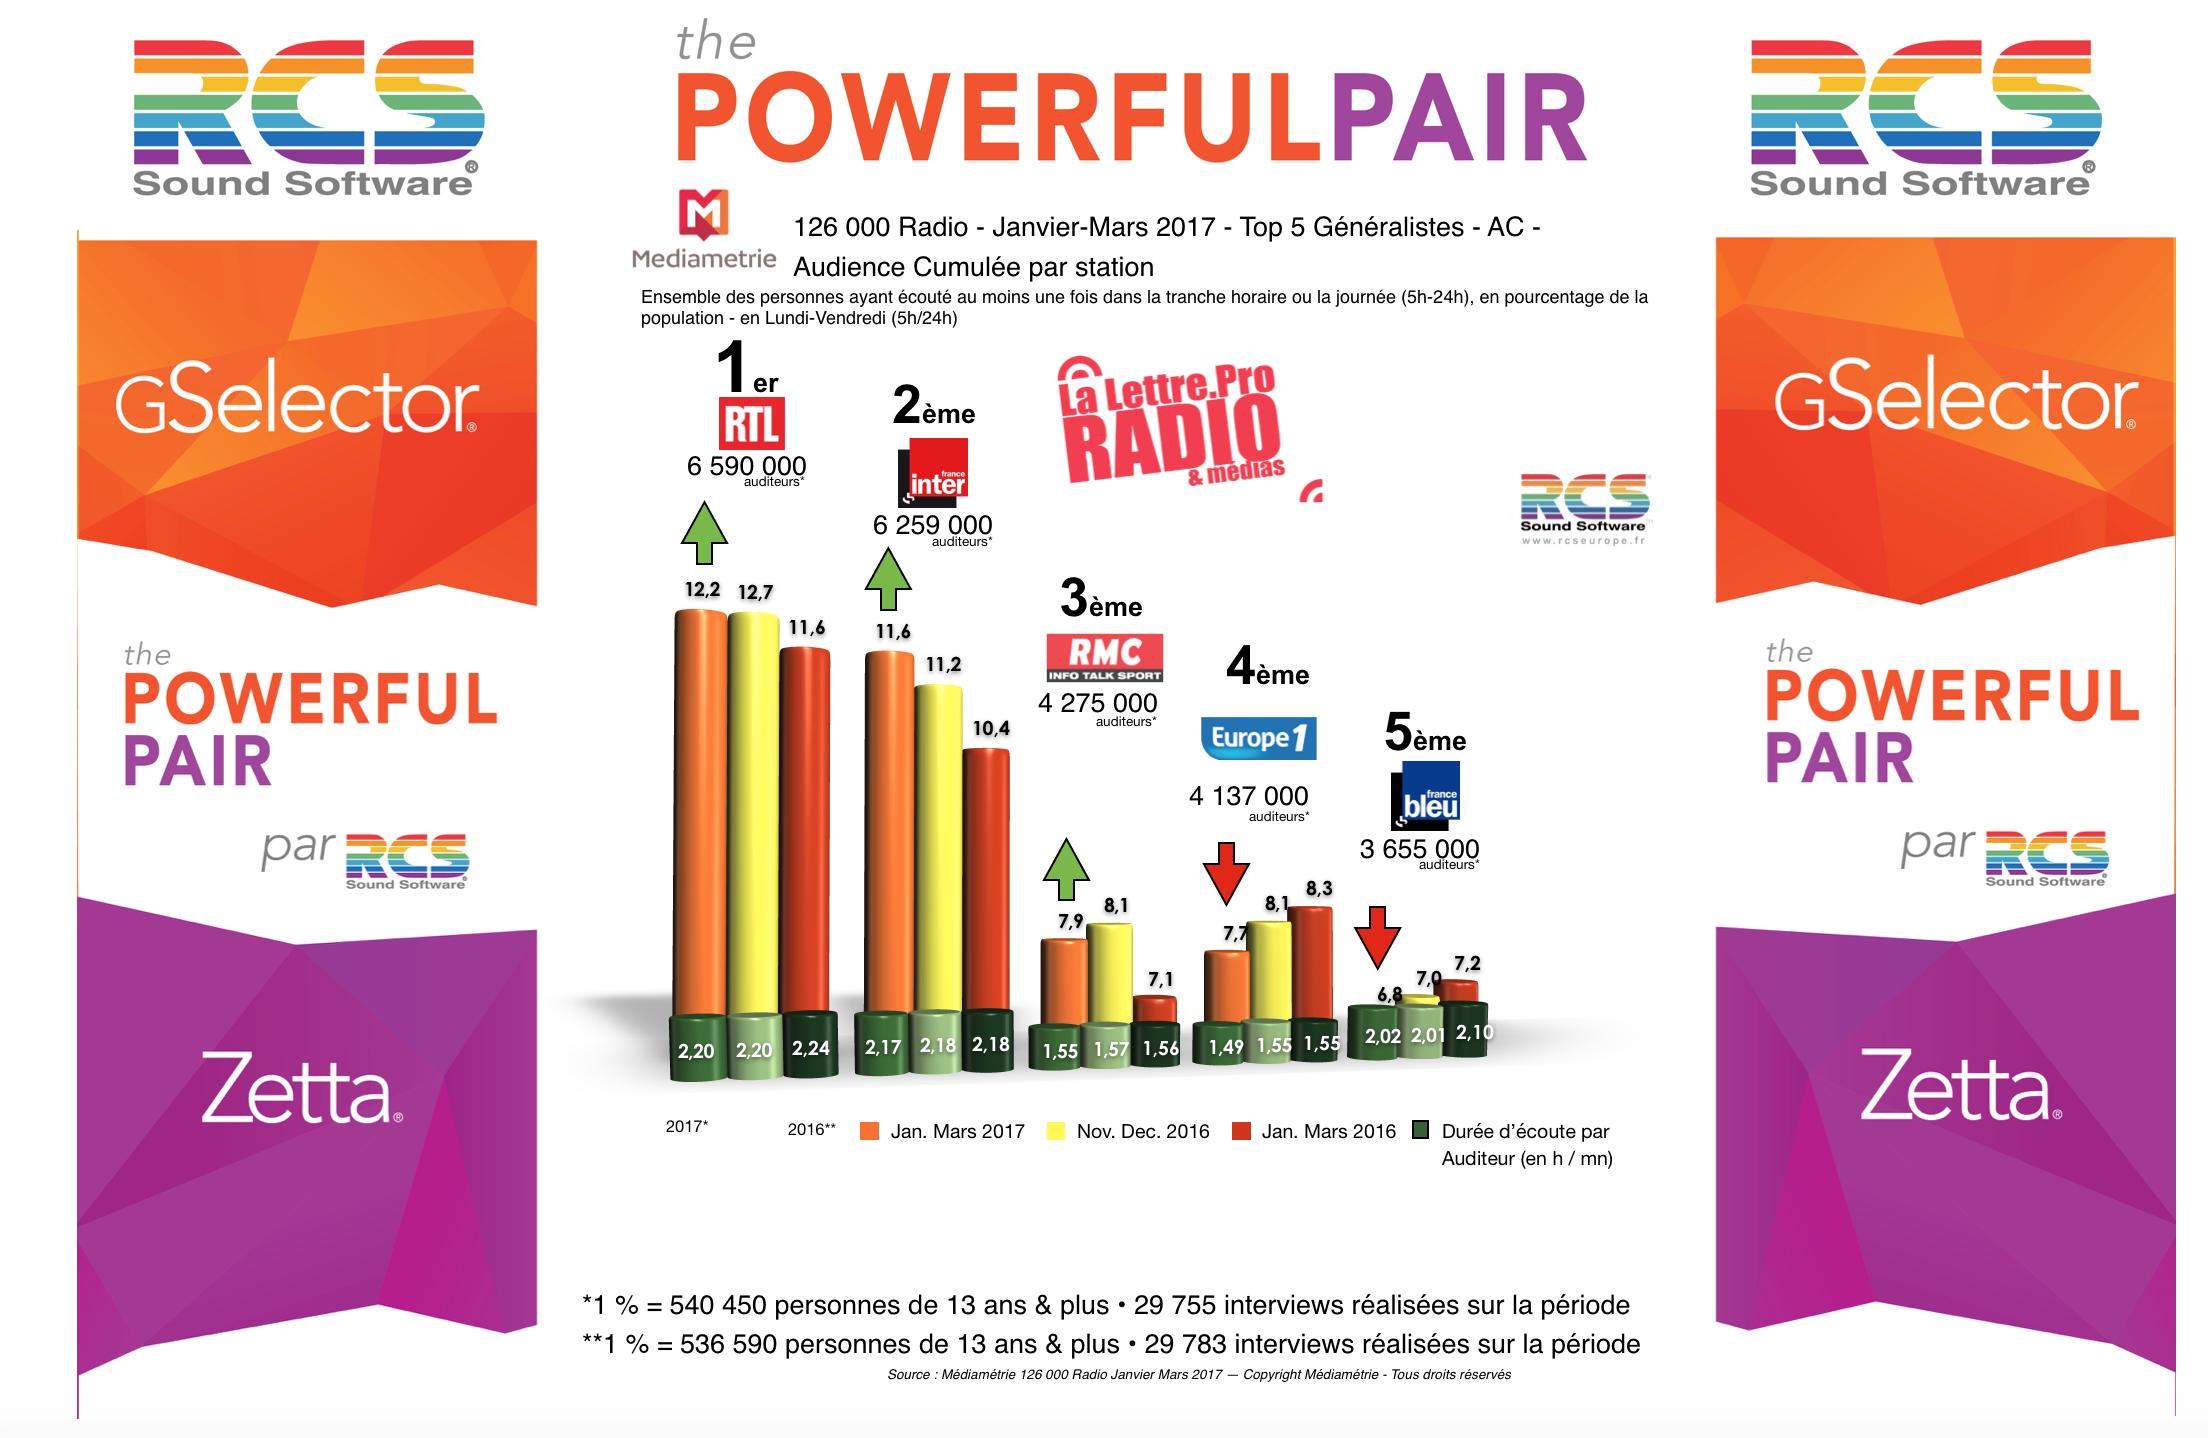 Diagramme exclusif LLP/RCS GSelector 4 - TOP 5 radios Généralistes en Lundi-Vendredi - 126 000 Radio Janvier-Mars 2017